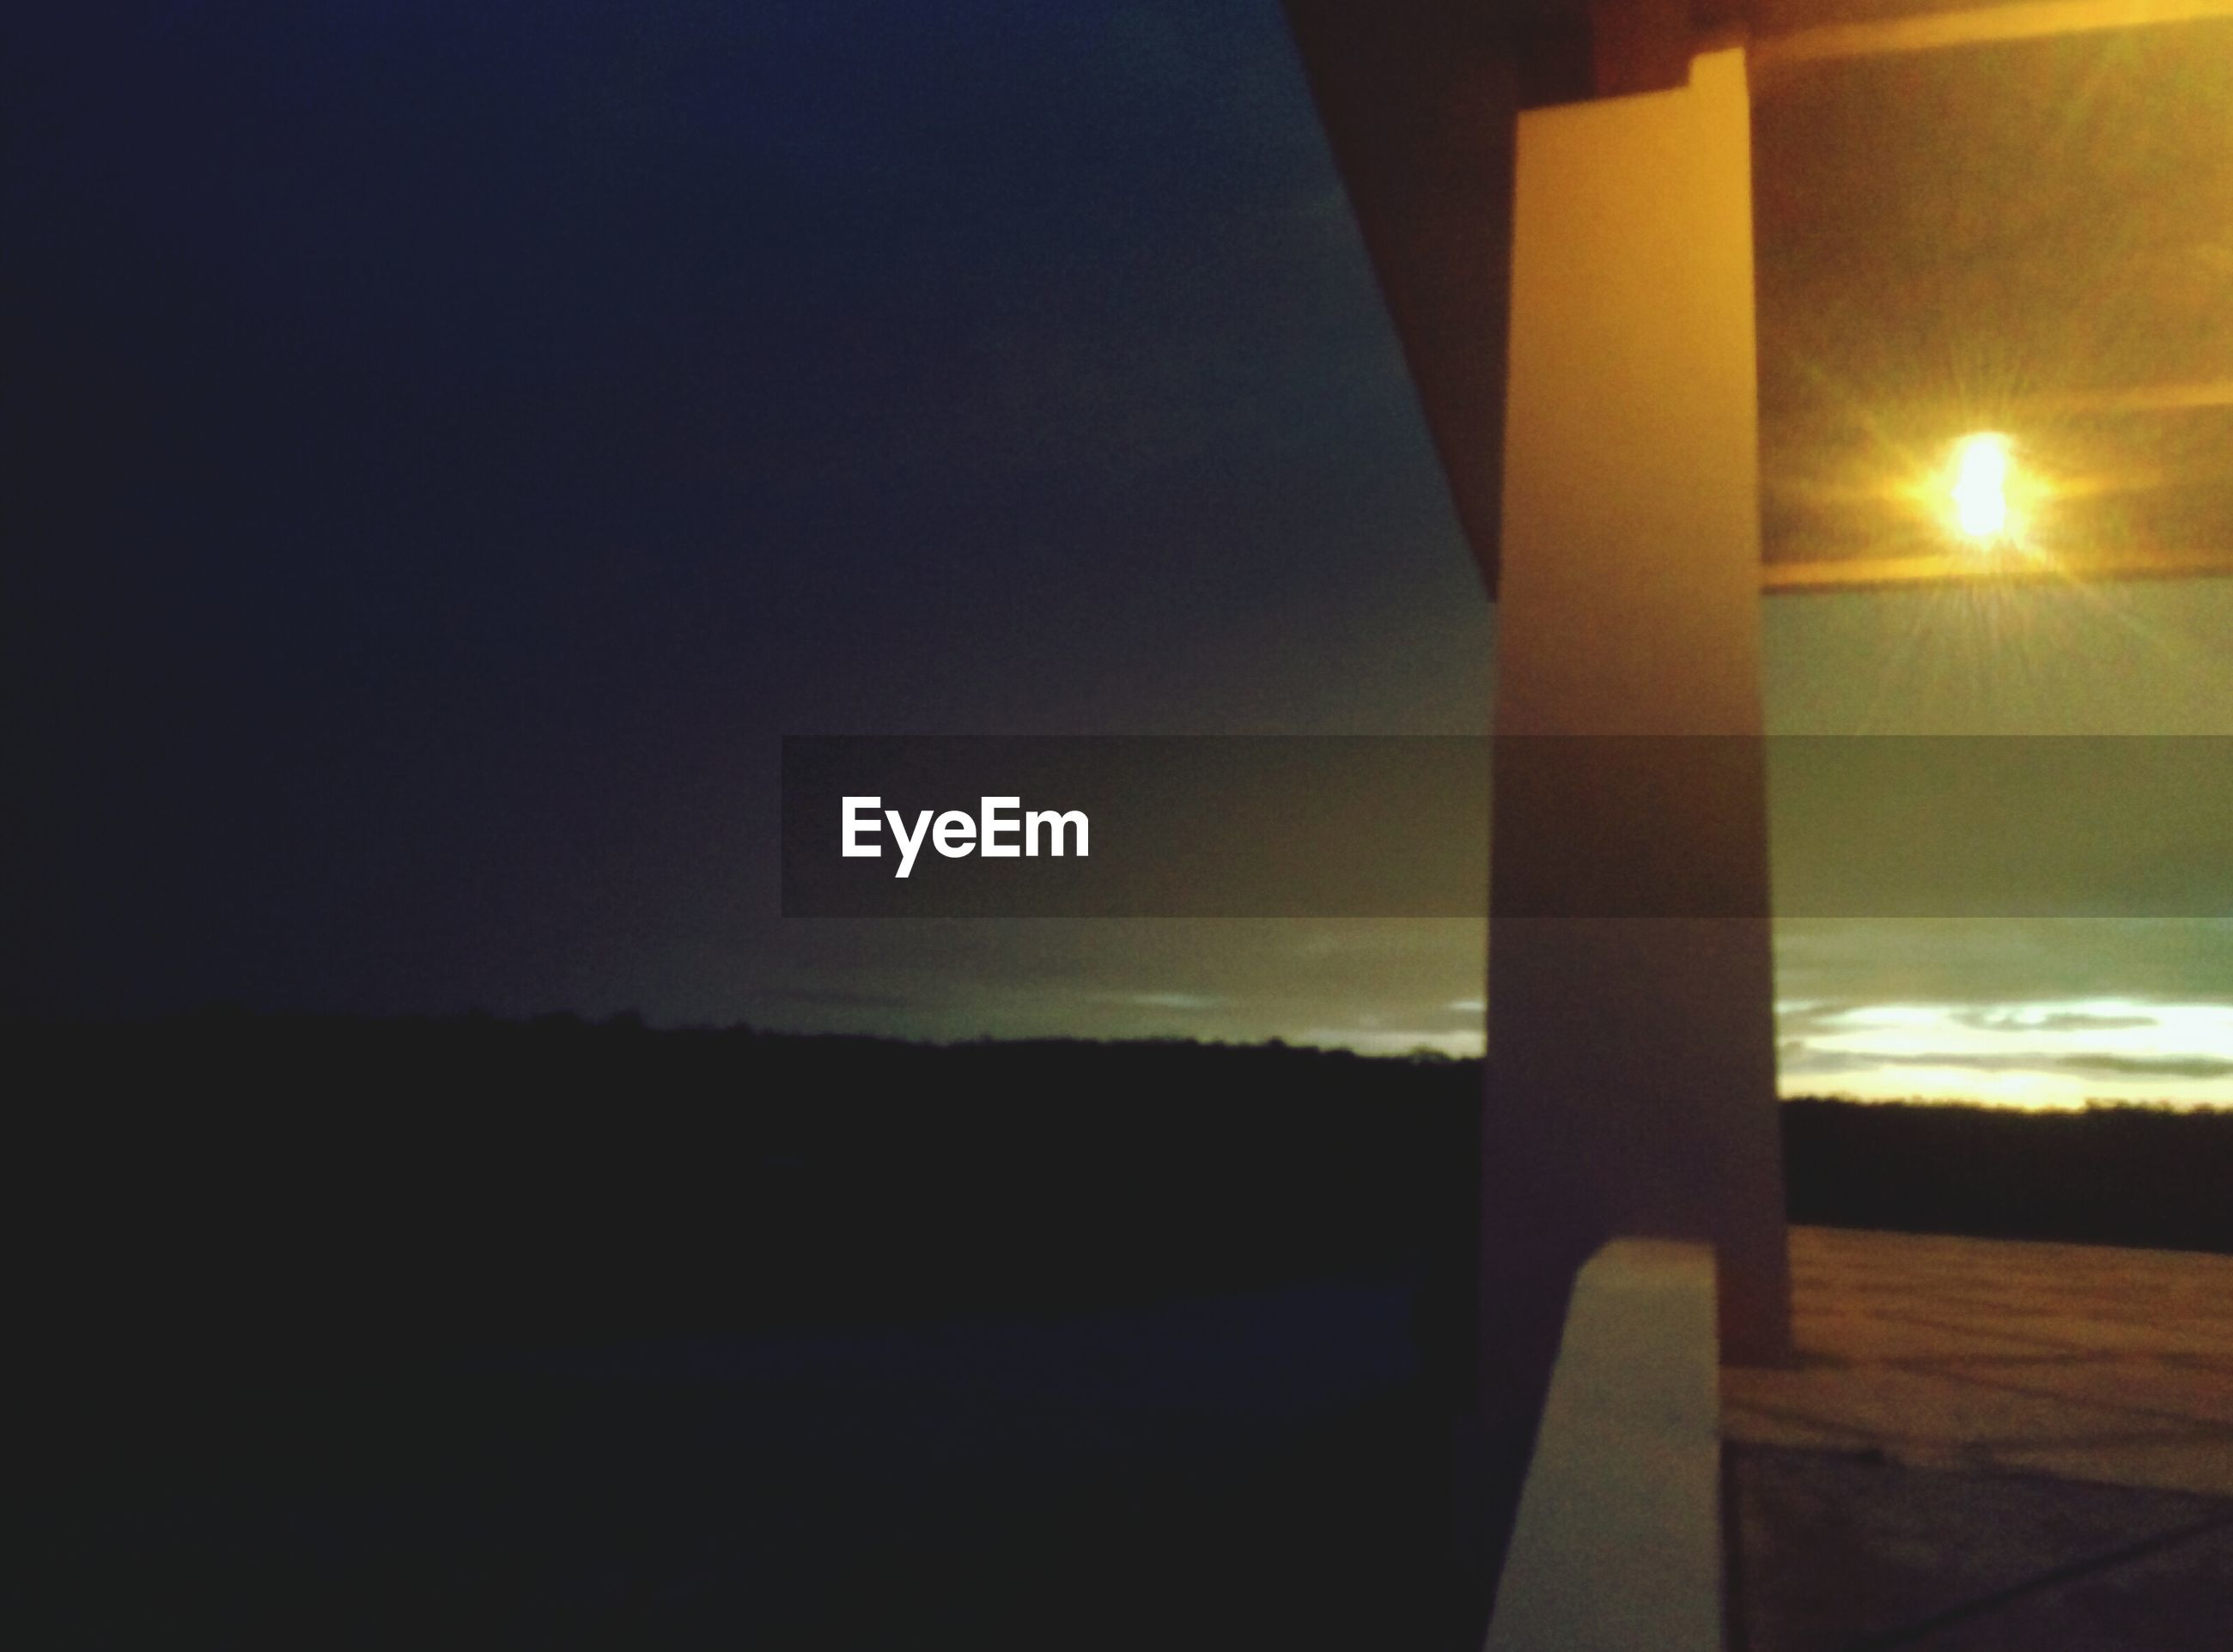 sunset, sun, silhouette, sunlight, sky, lens flare, tranquility, sunbeam, nature, clear sky, tranquil scene, no people, beauty in nature, scenics, dusk, street light, dark, outdoors, built structure, illuminated